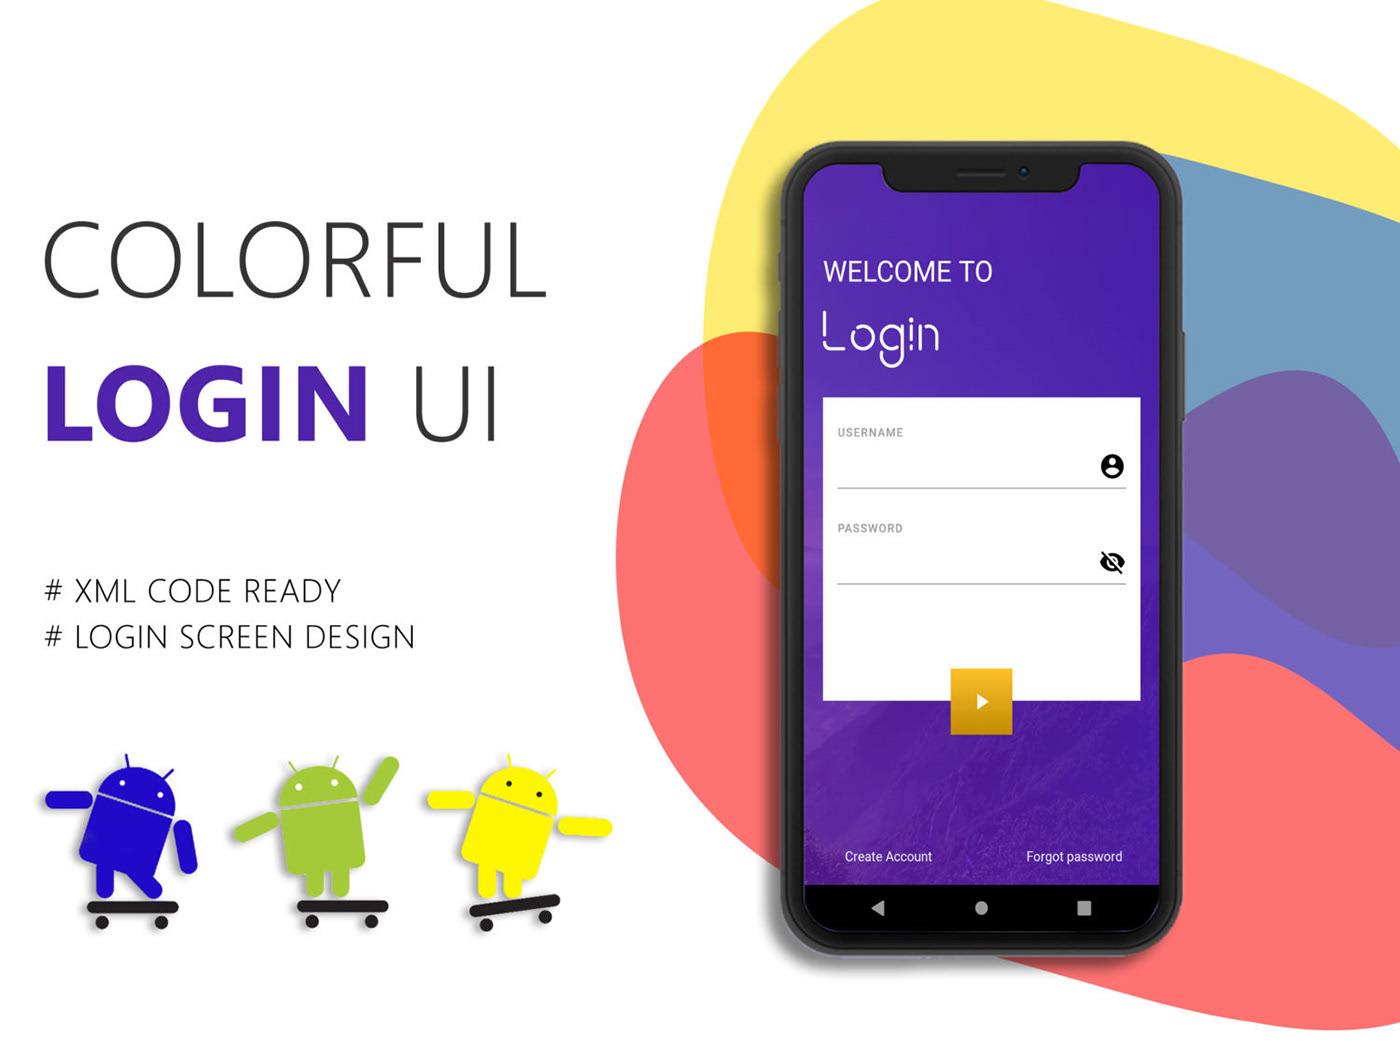 Colorful Login UI Kit